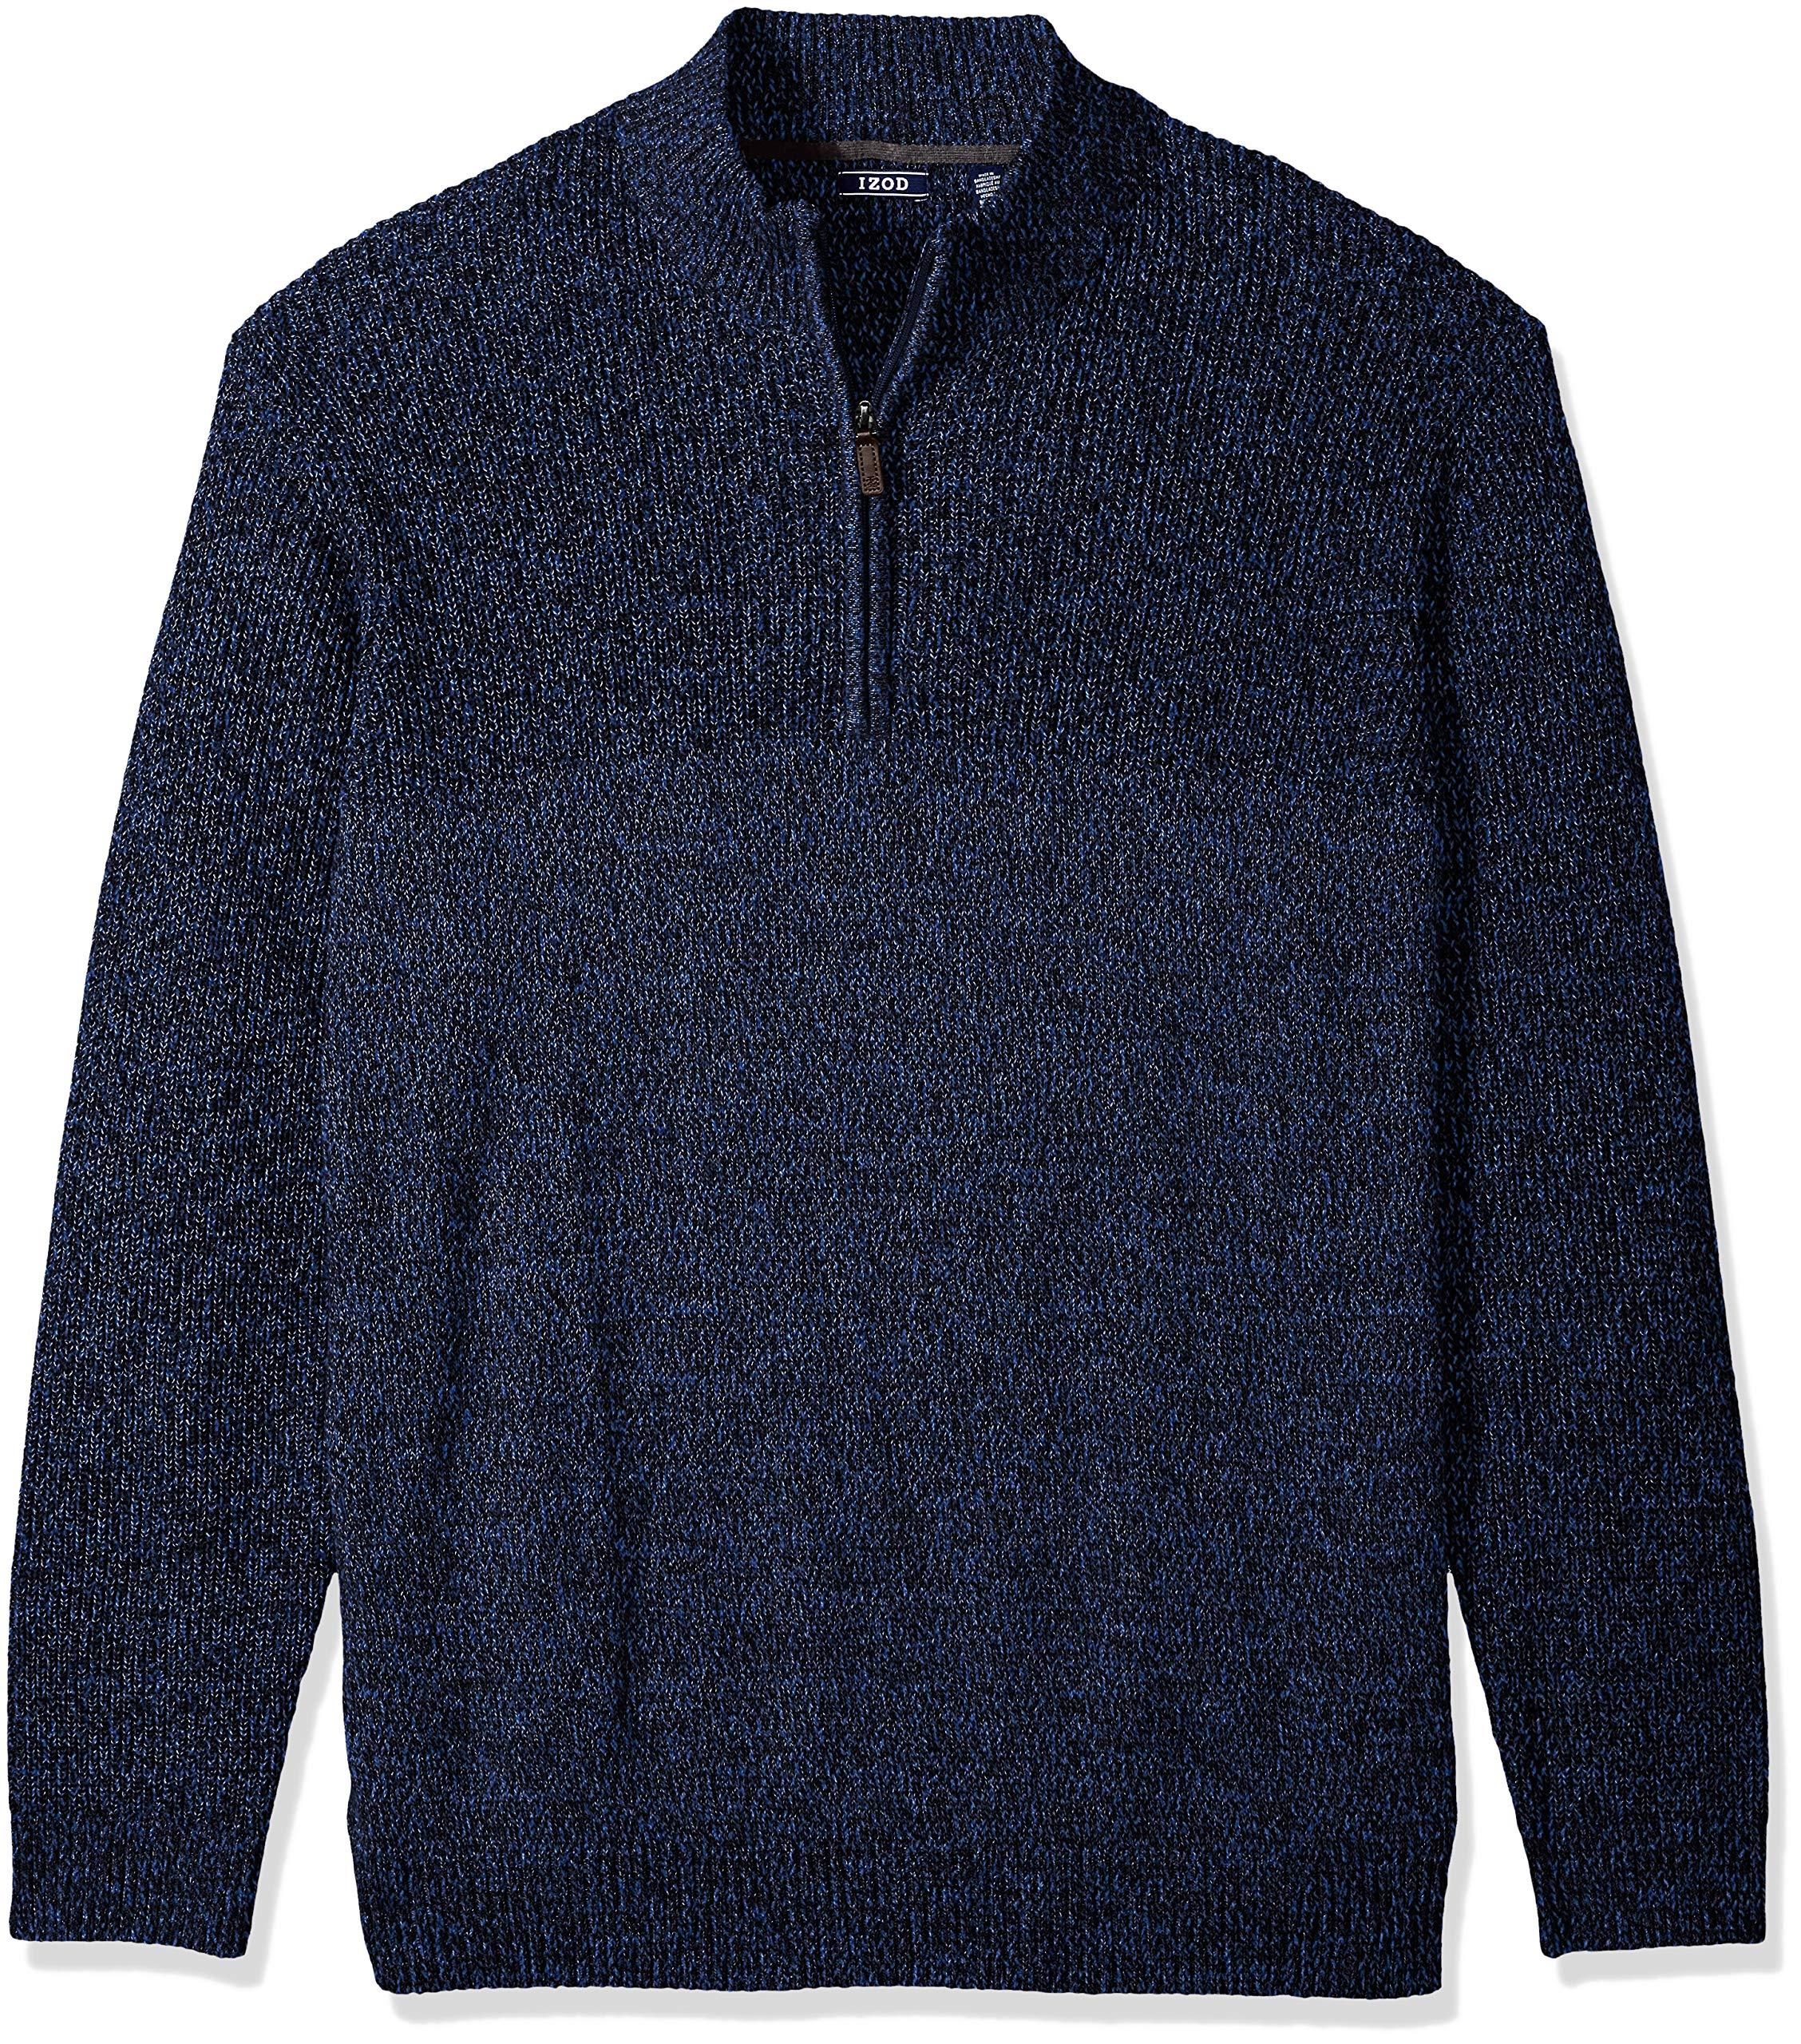 IZOD Men's Big and Tall Newport Marled Quarter Zip 7 Gauge Textured Sweater, New Peacoat, X-Large